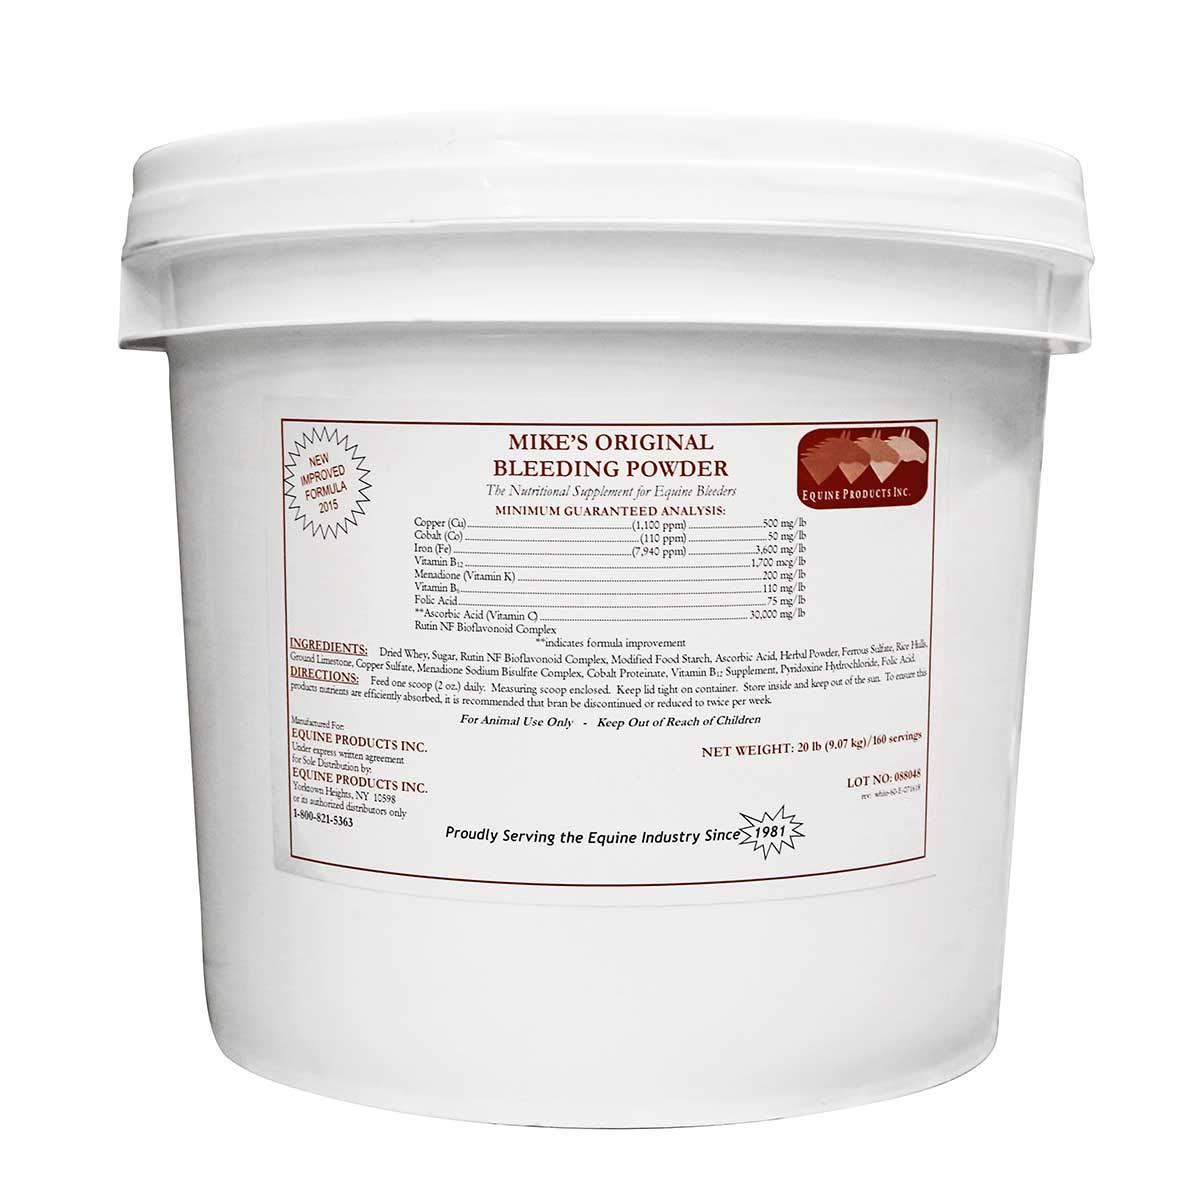 Equine Products Inc Mikes Original Bleeding Powder 20 lbs